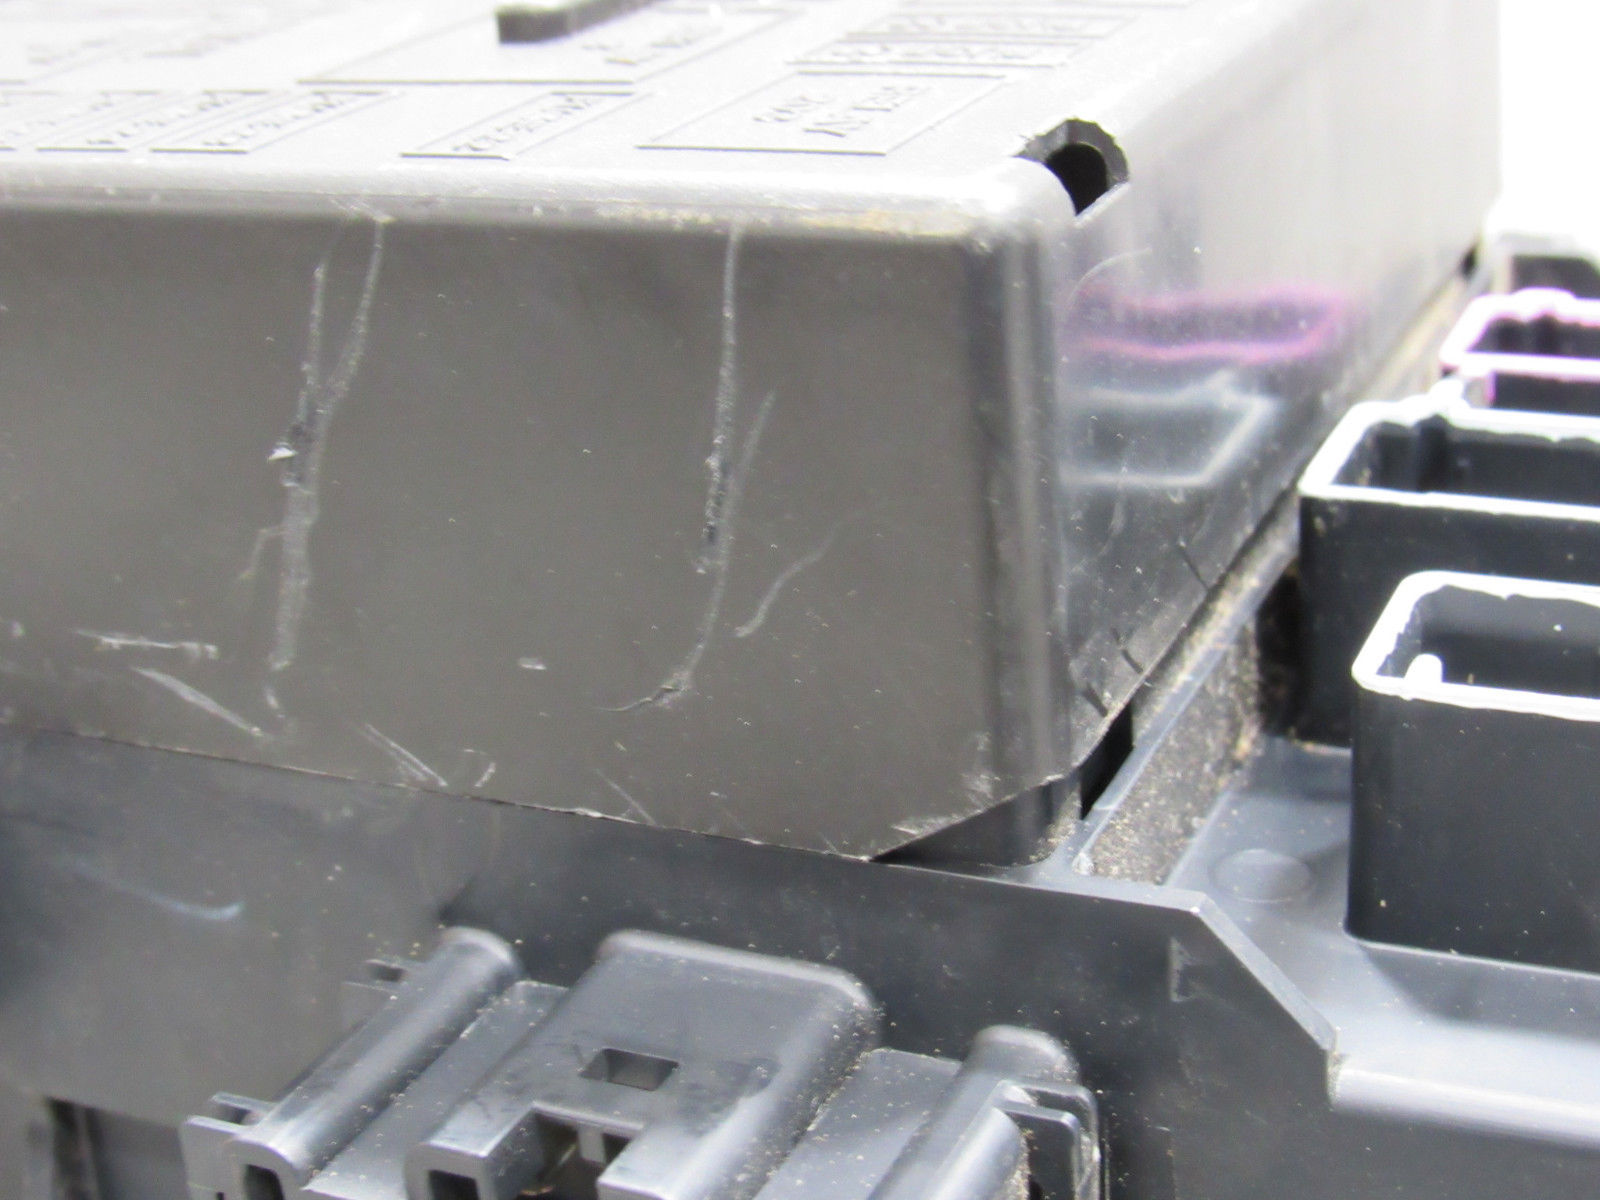 03 Expedition Navigator Interior Fuse Relay Box Block Center 2l1t 14a067 Ap Dp